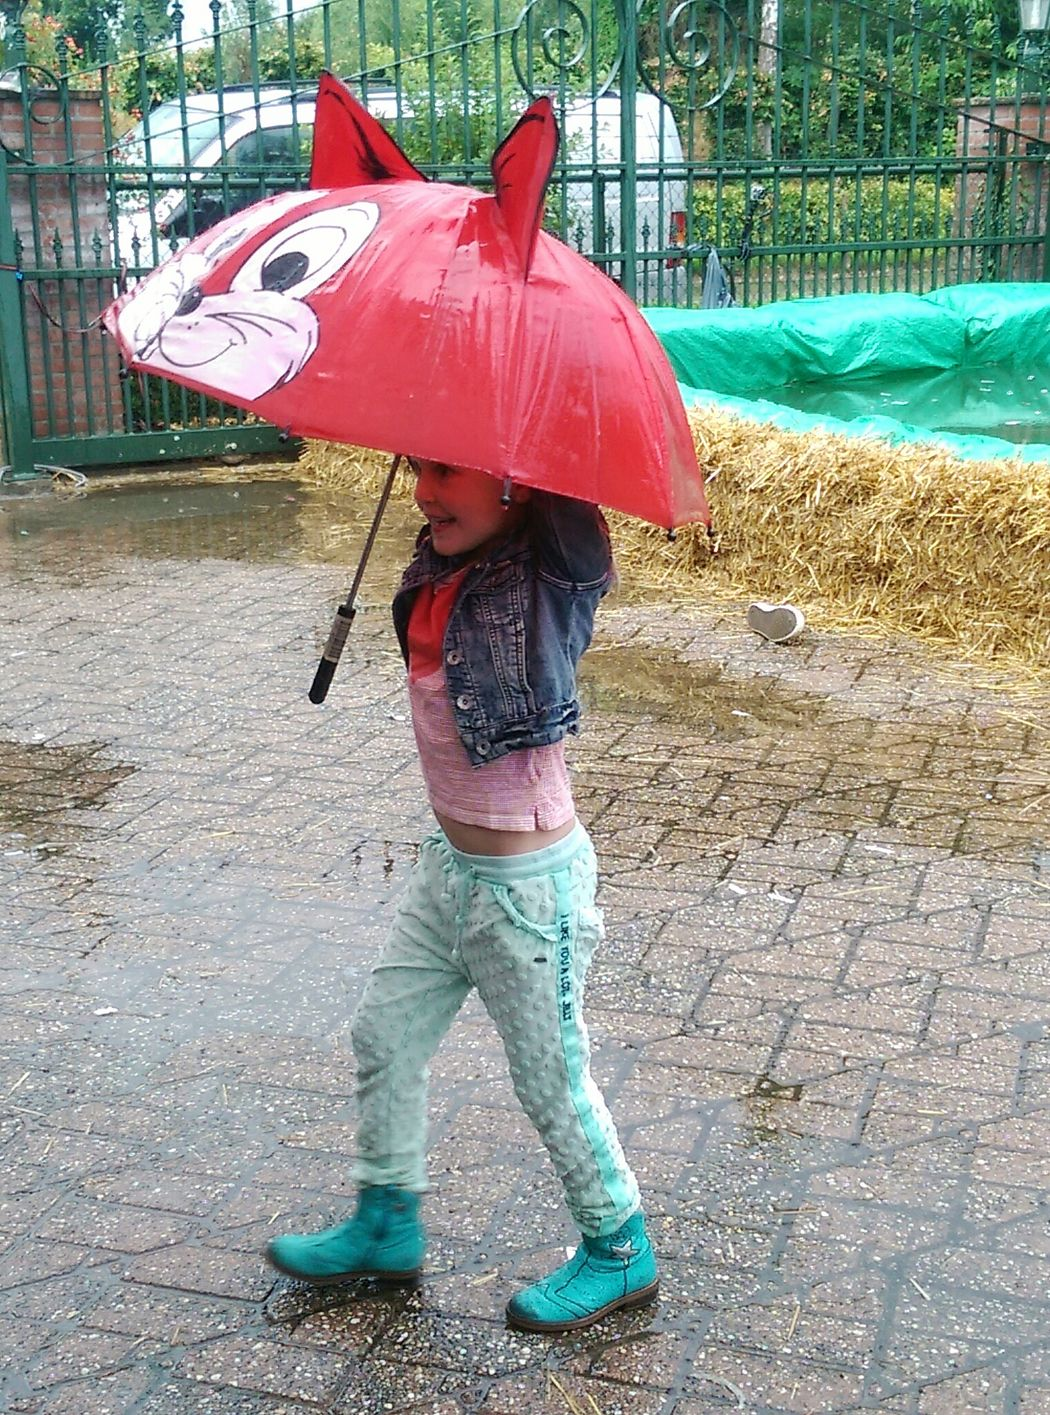 Umbrella Girl Rainy Day Splash Red Cat Umbrella Having Fun People Photography Urban Taking Photos Enjoying Life Outdoor Photography